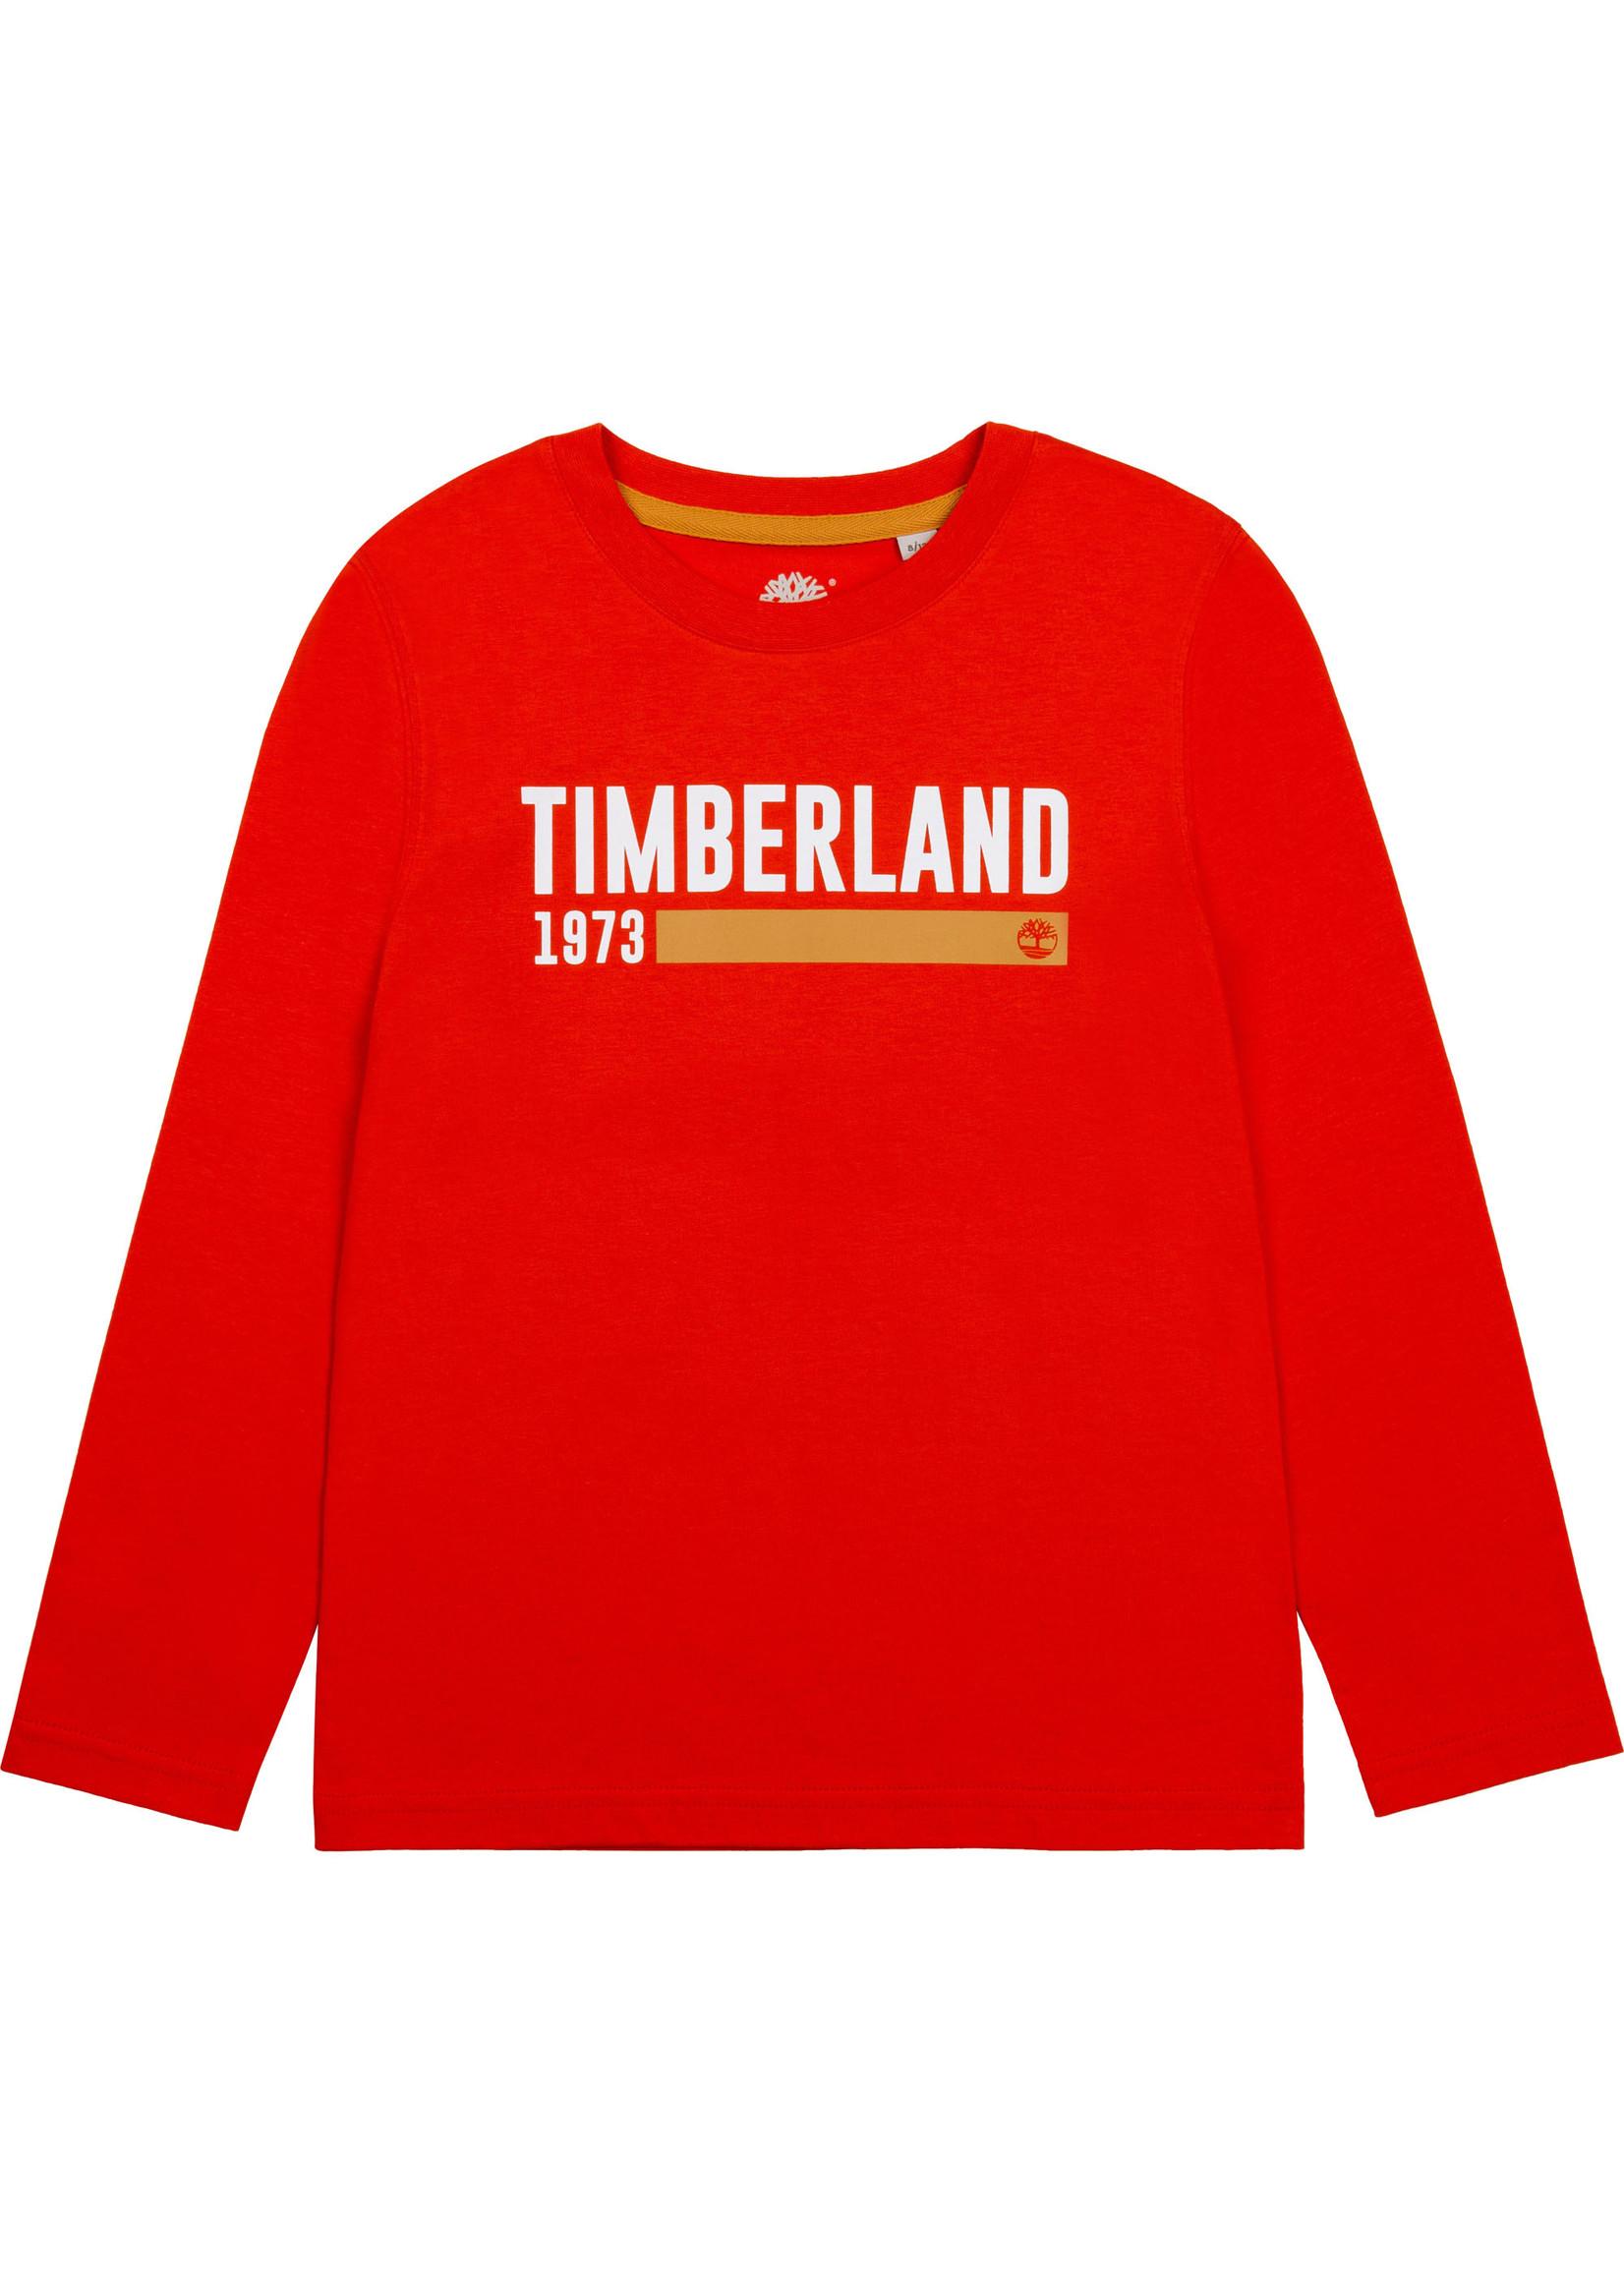 Timberland TIMBERLAND Longsleeve basic chile red